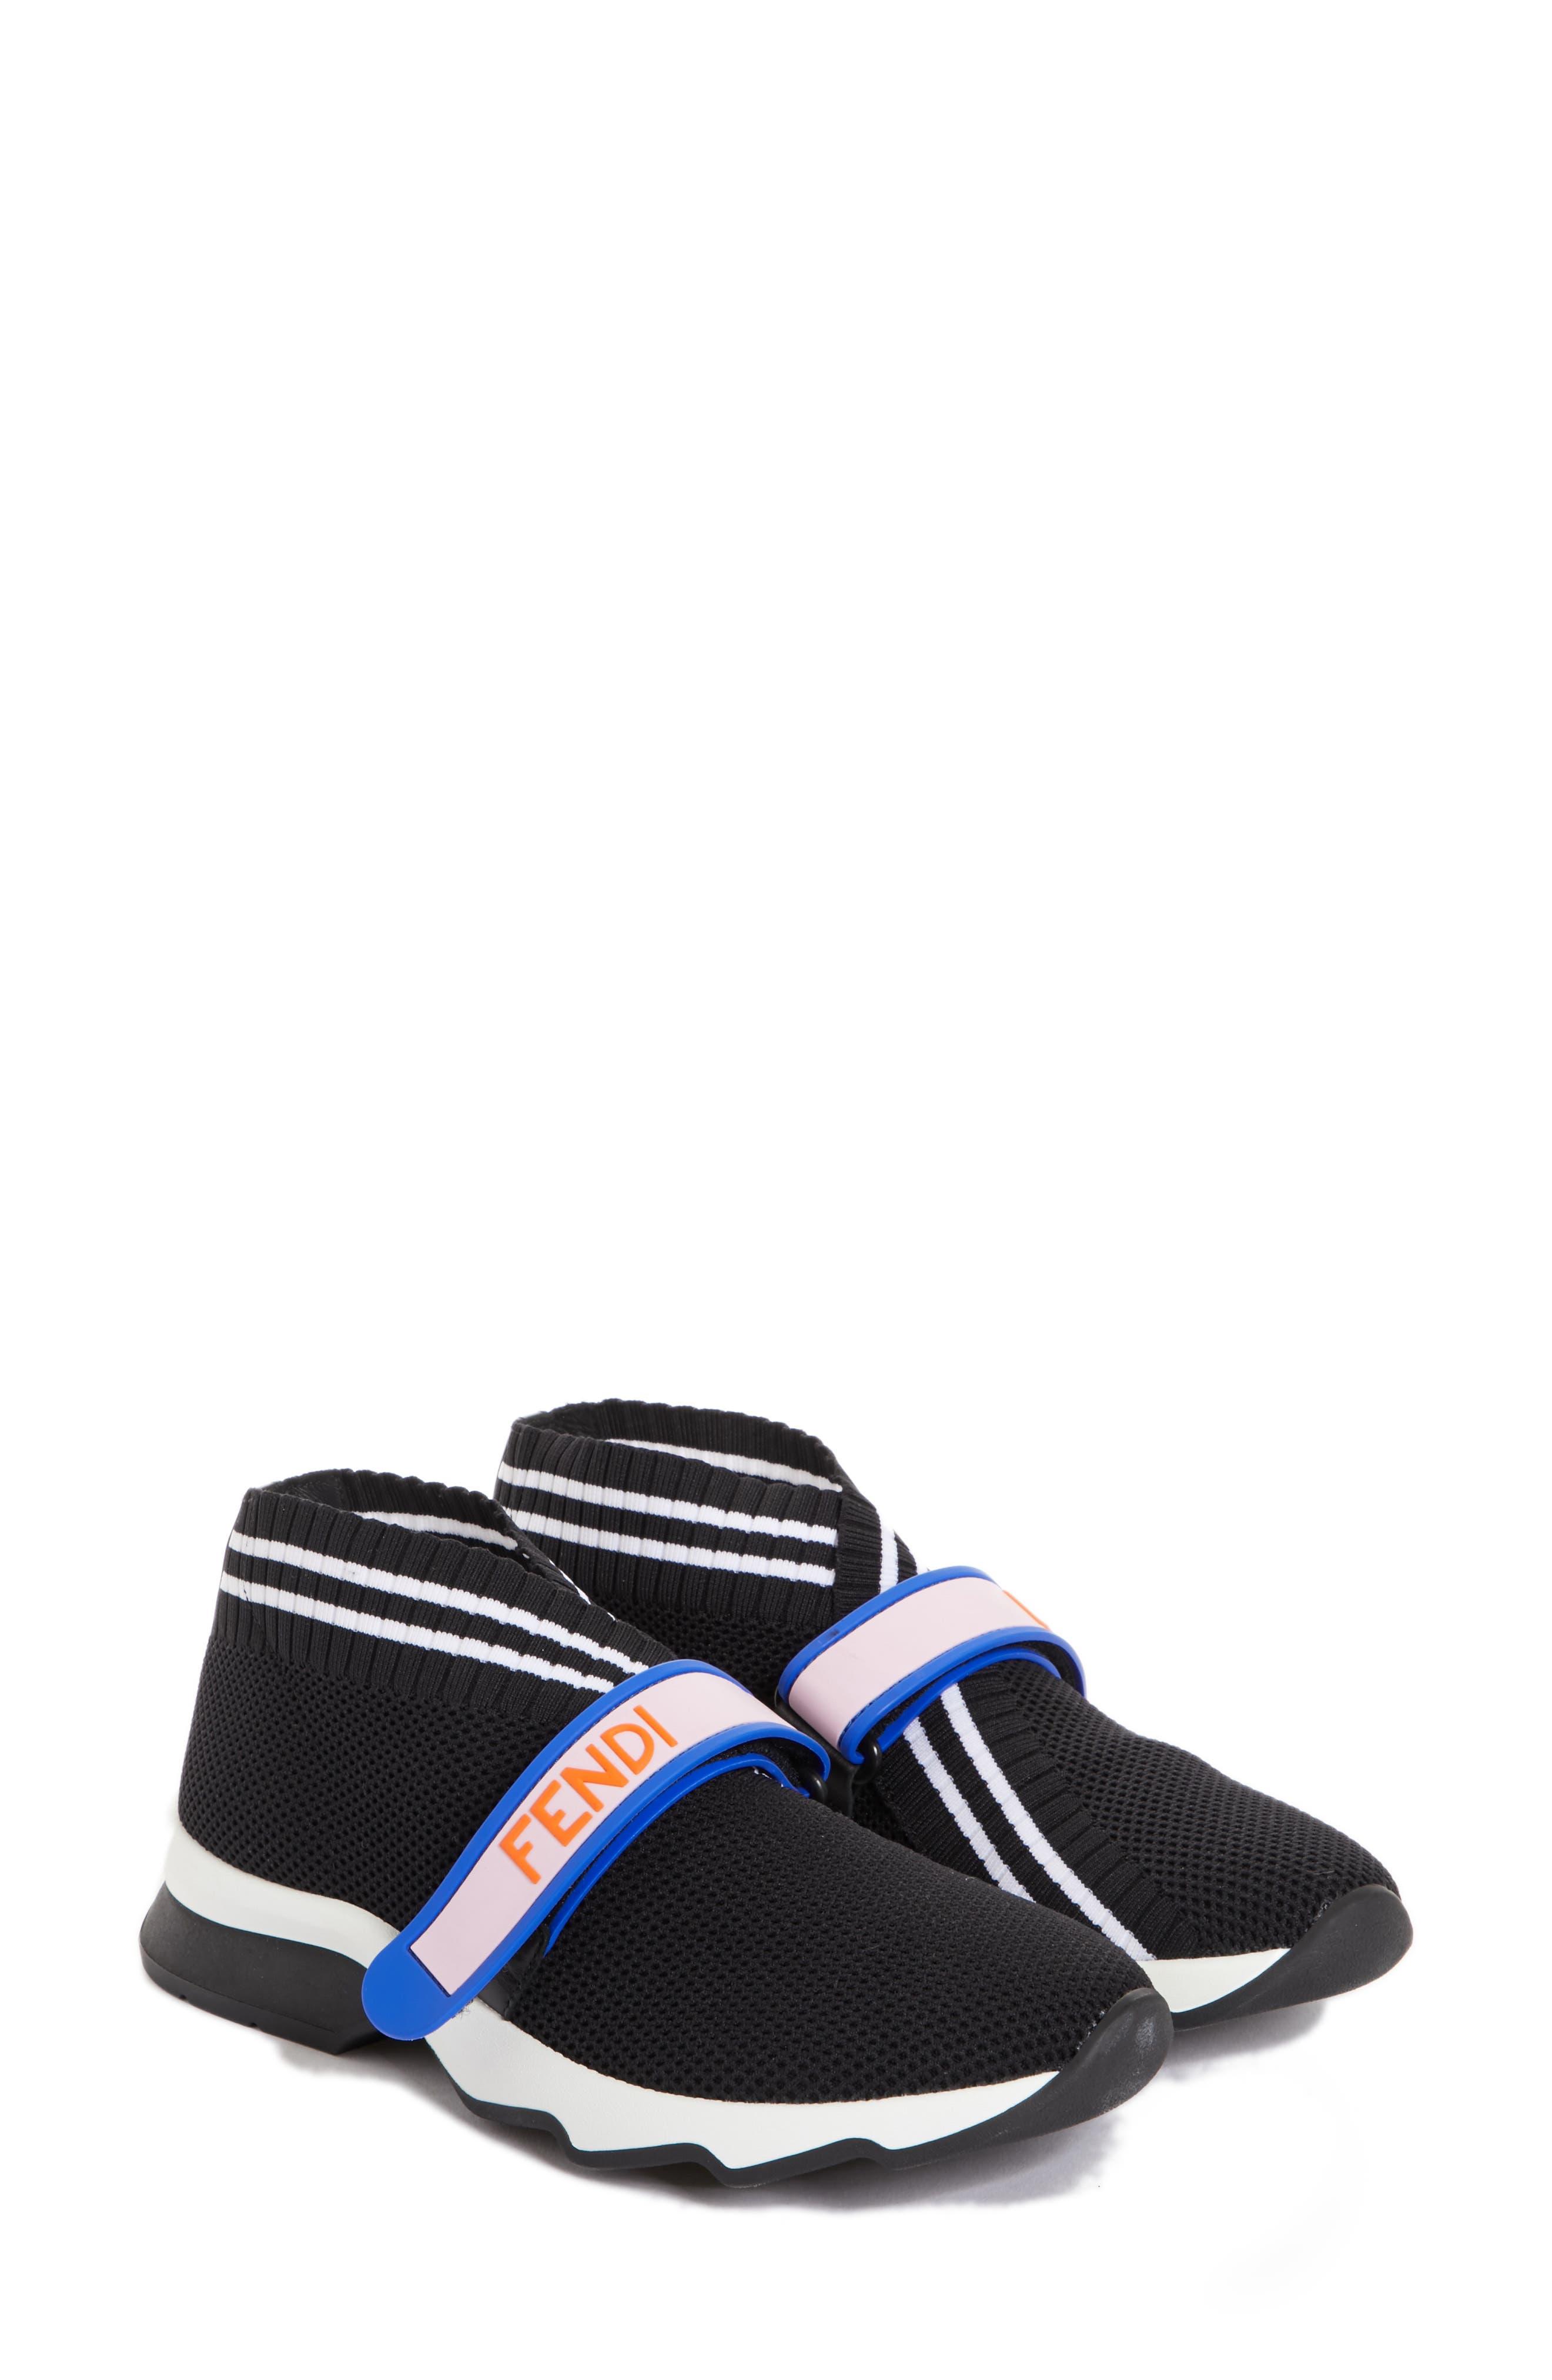 Rockoko Mismatch Sneaker,                         Main,                         color, Black